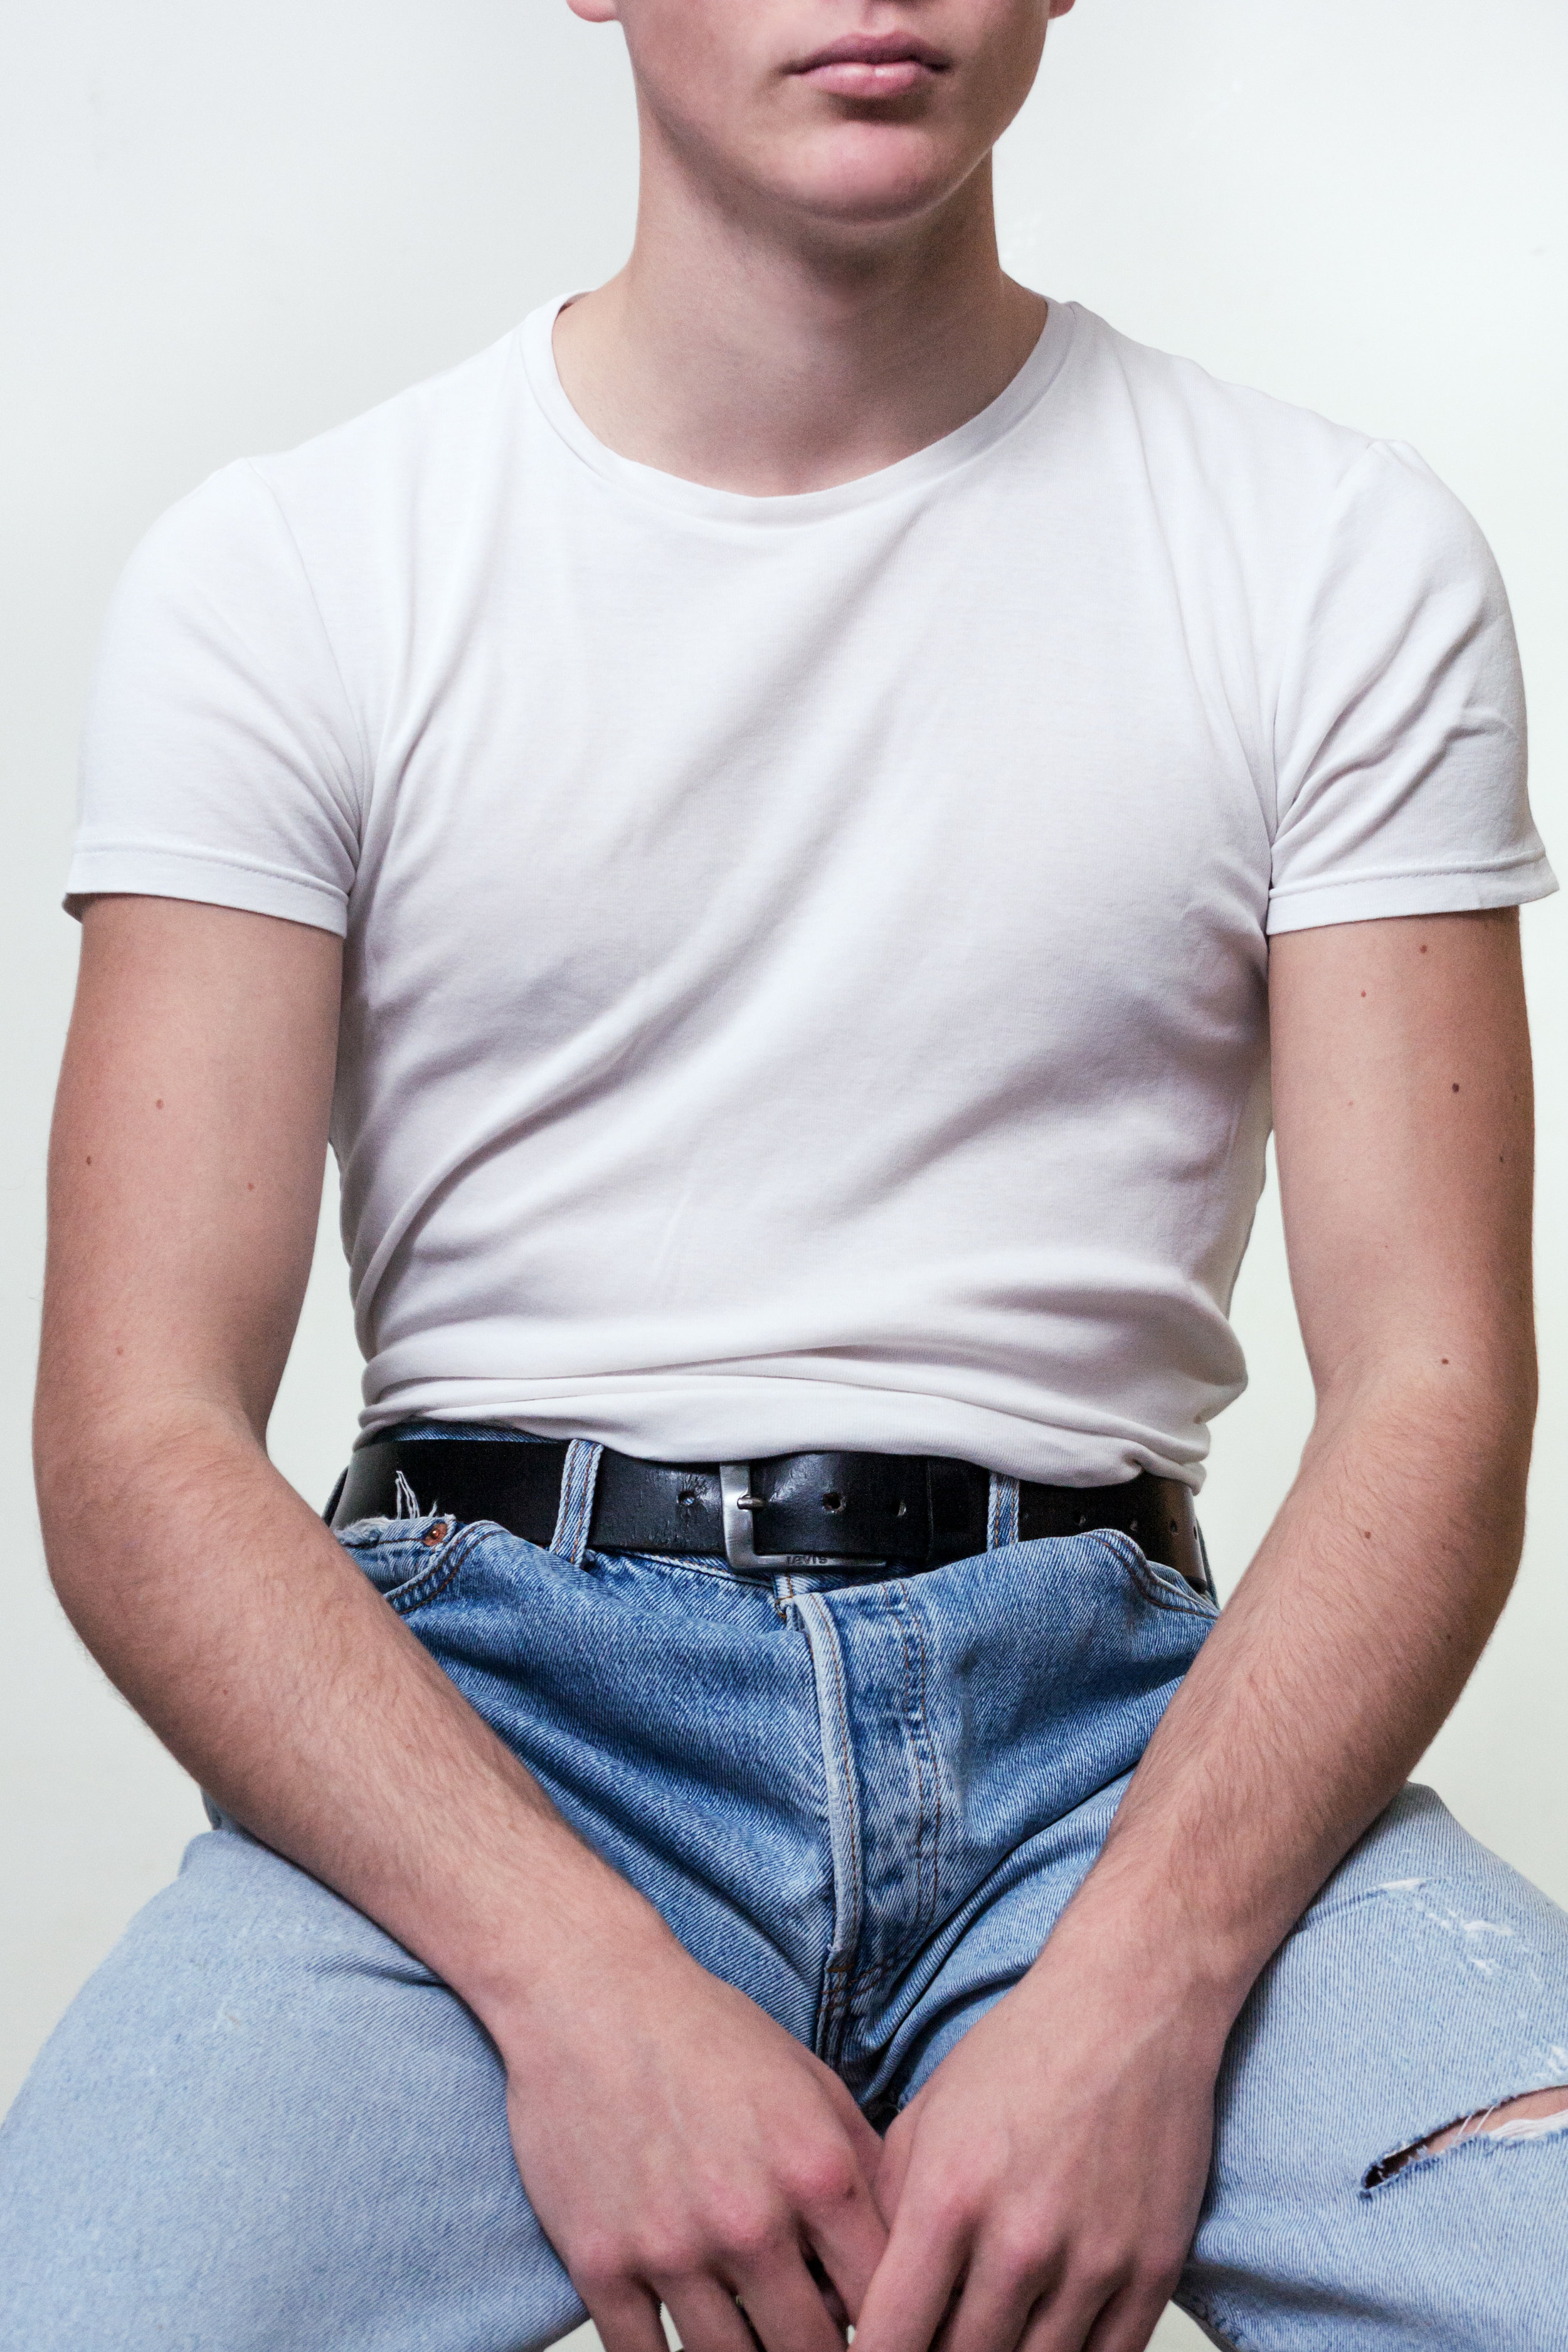 Blue jeans boy 7.jpg